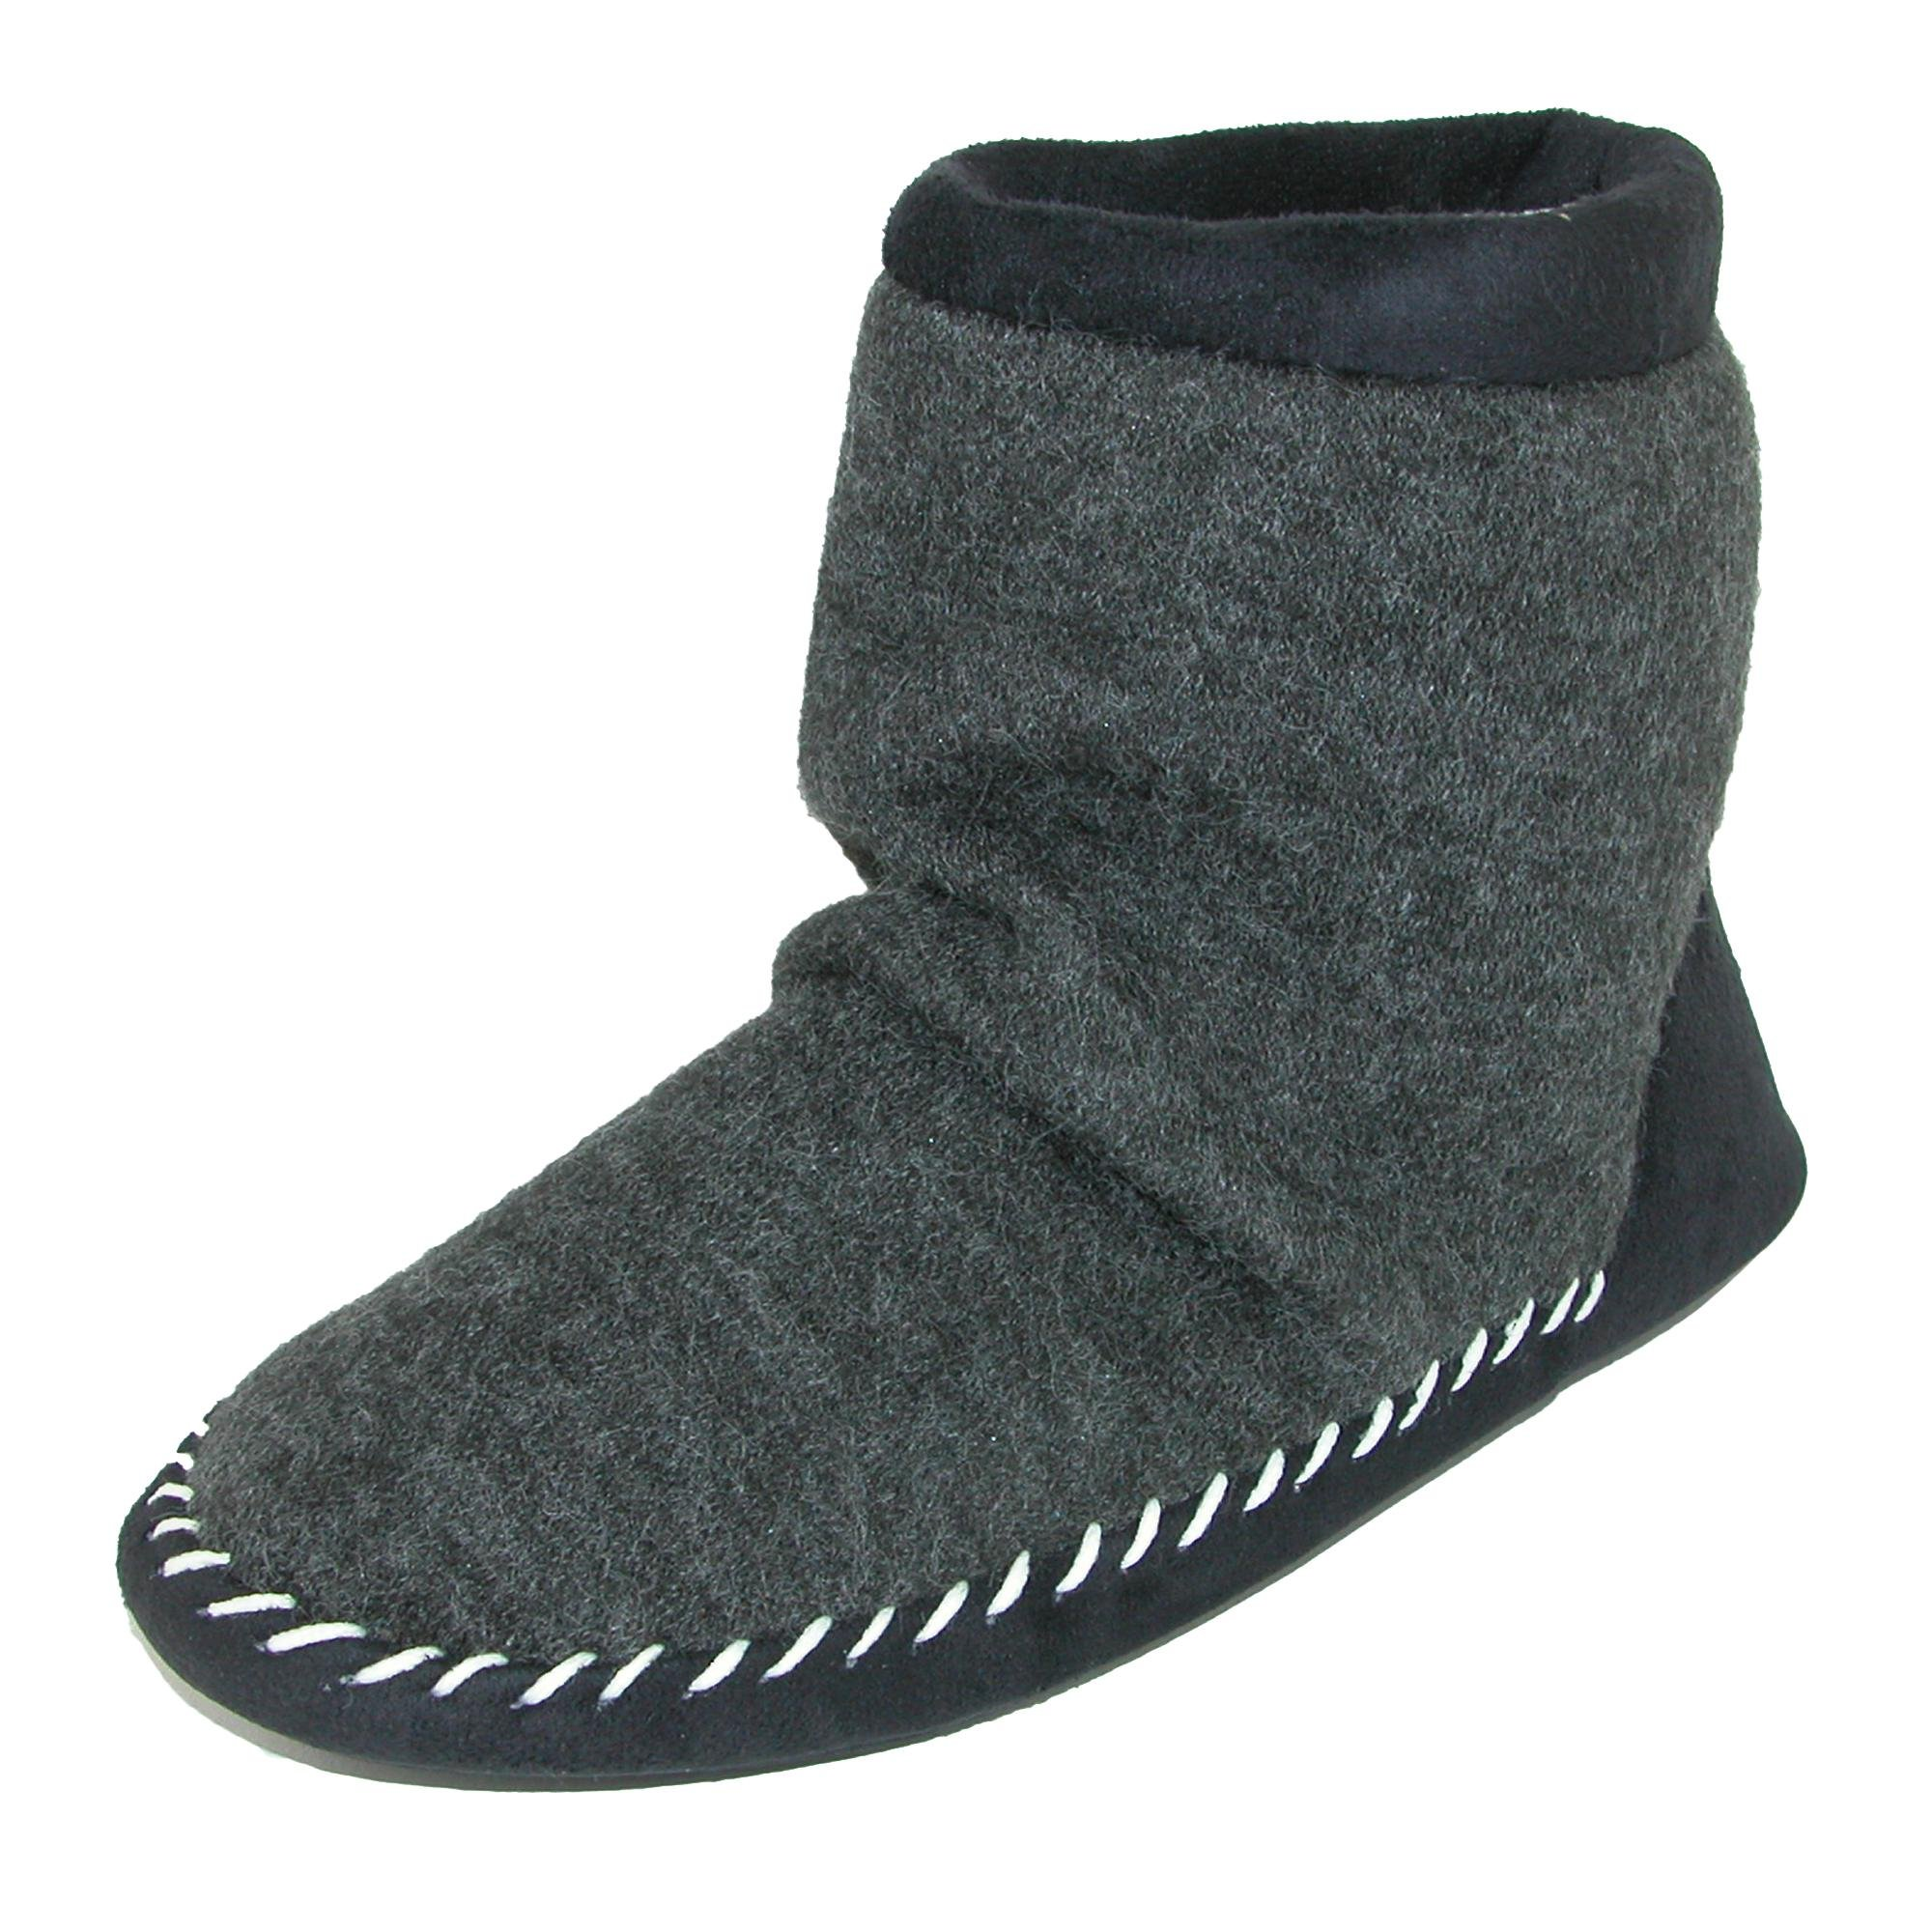 ISOTONER Women's Microsuede & Heather Knit Marisol Boot Black Medium 6.5-7.5